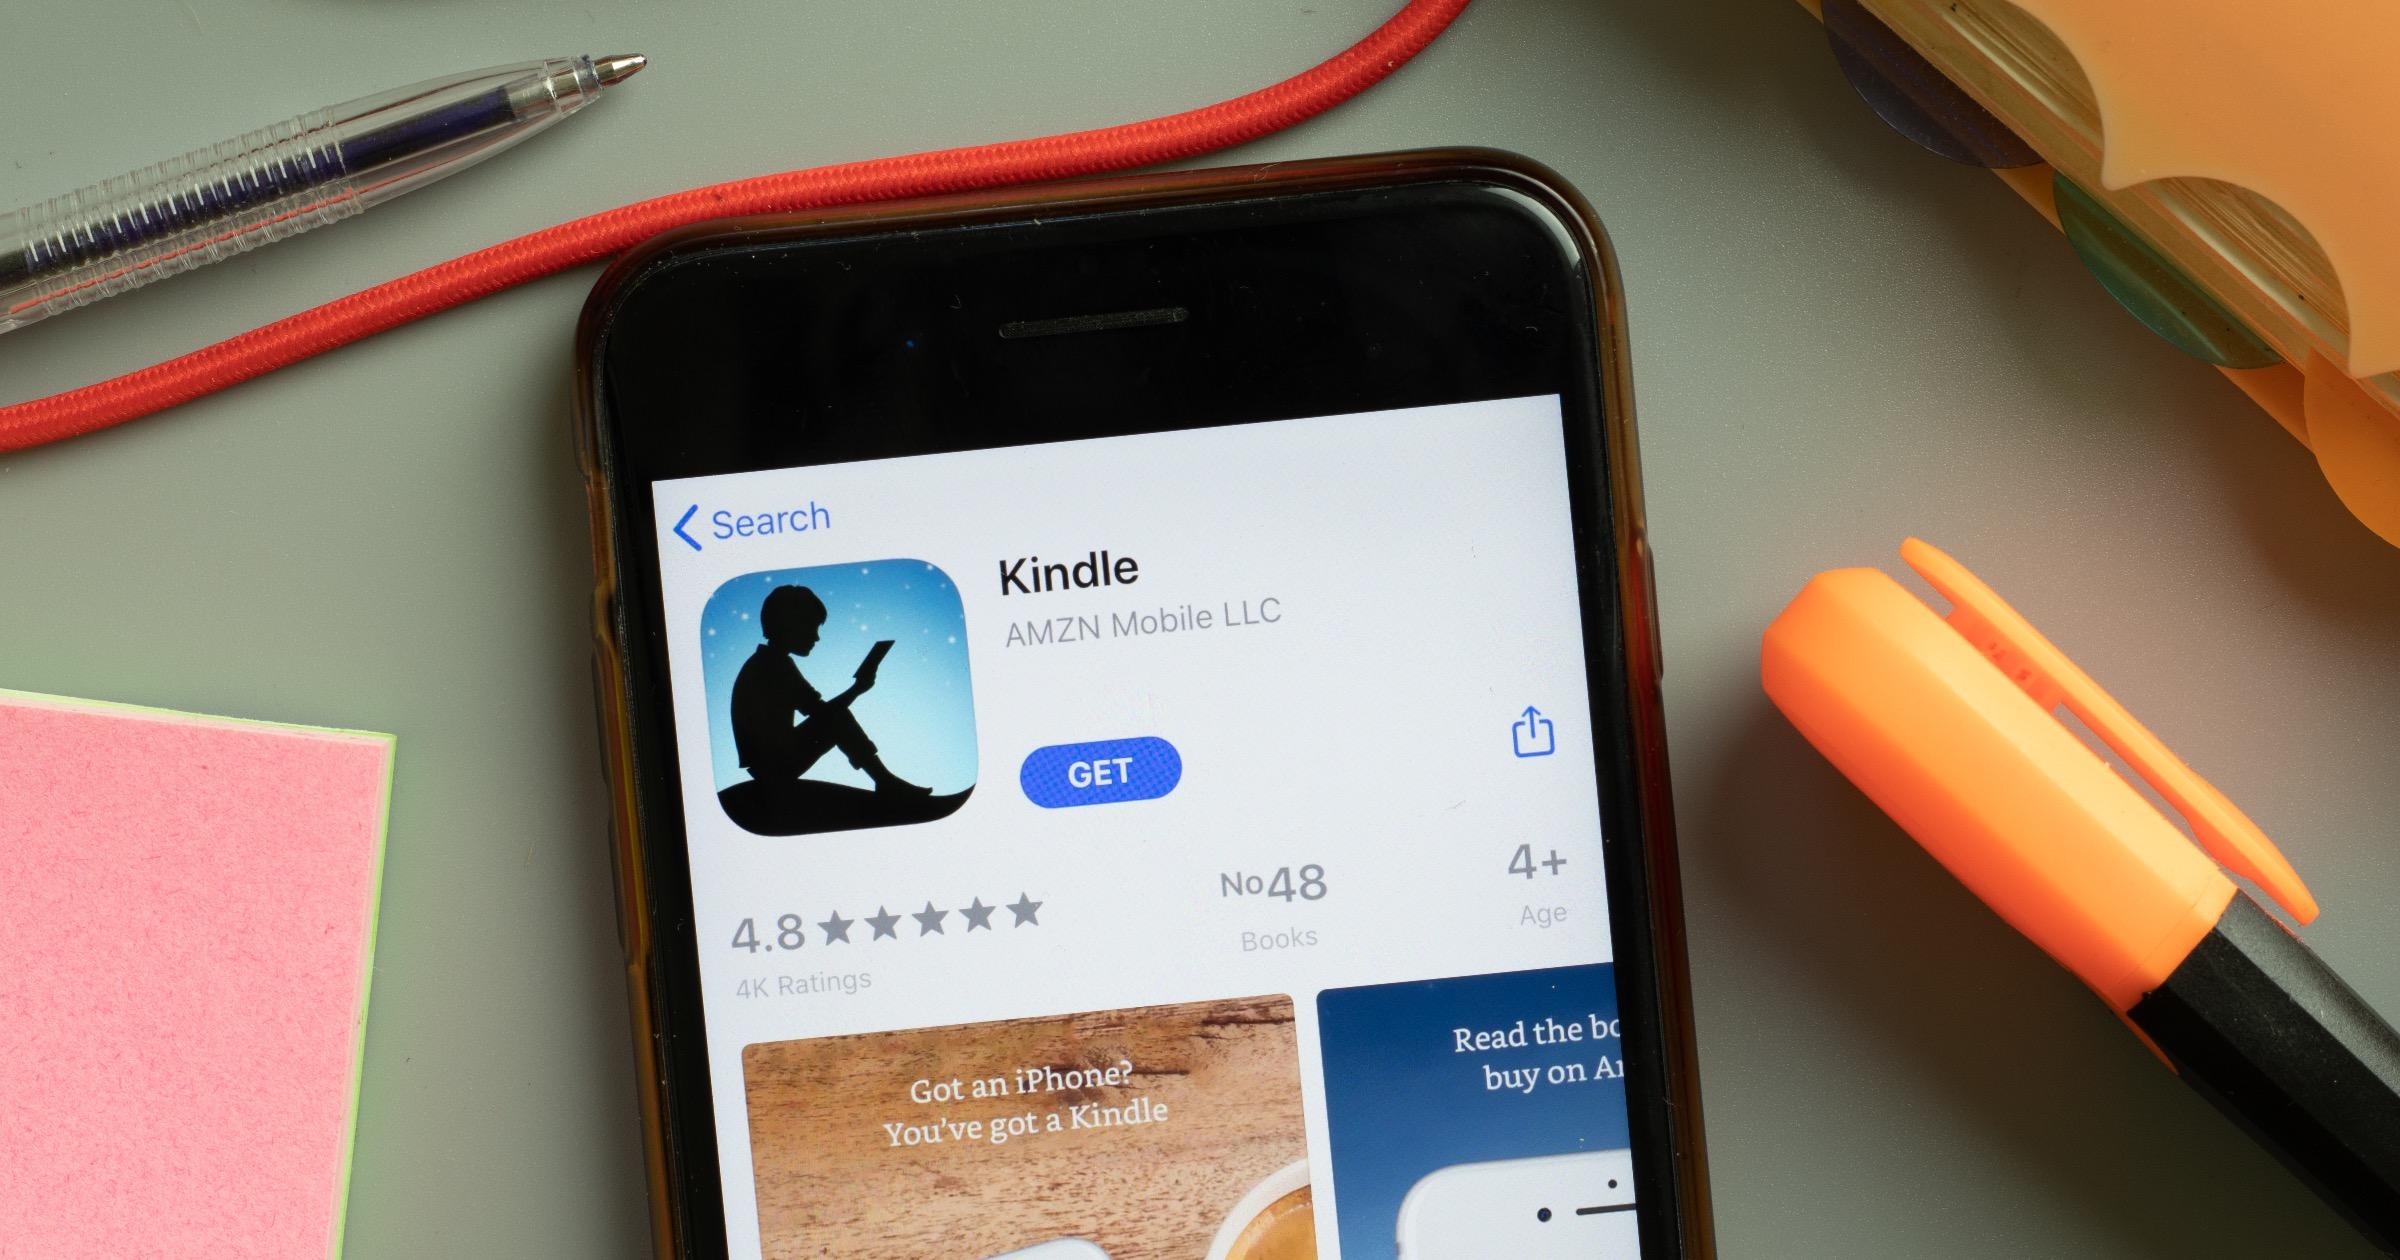 Kindle app on iPhone